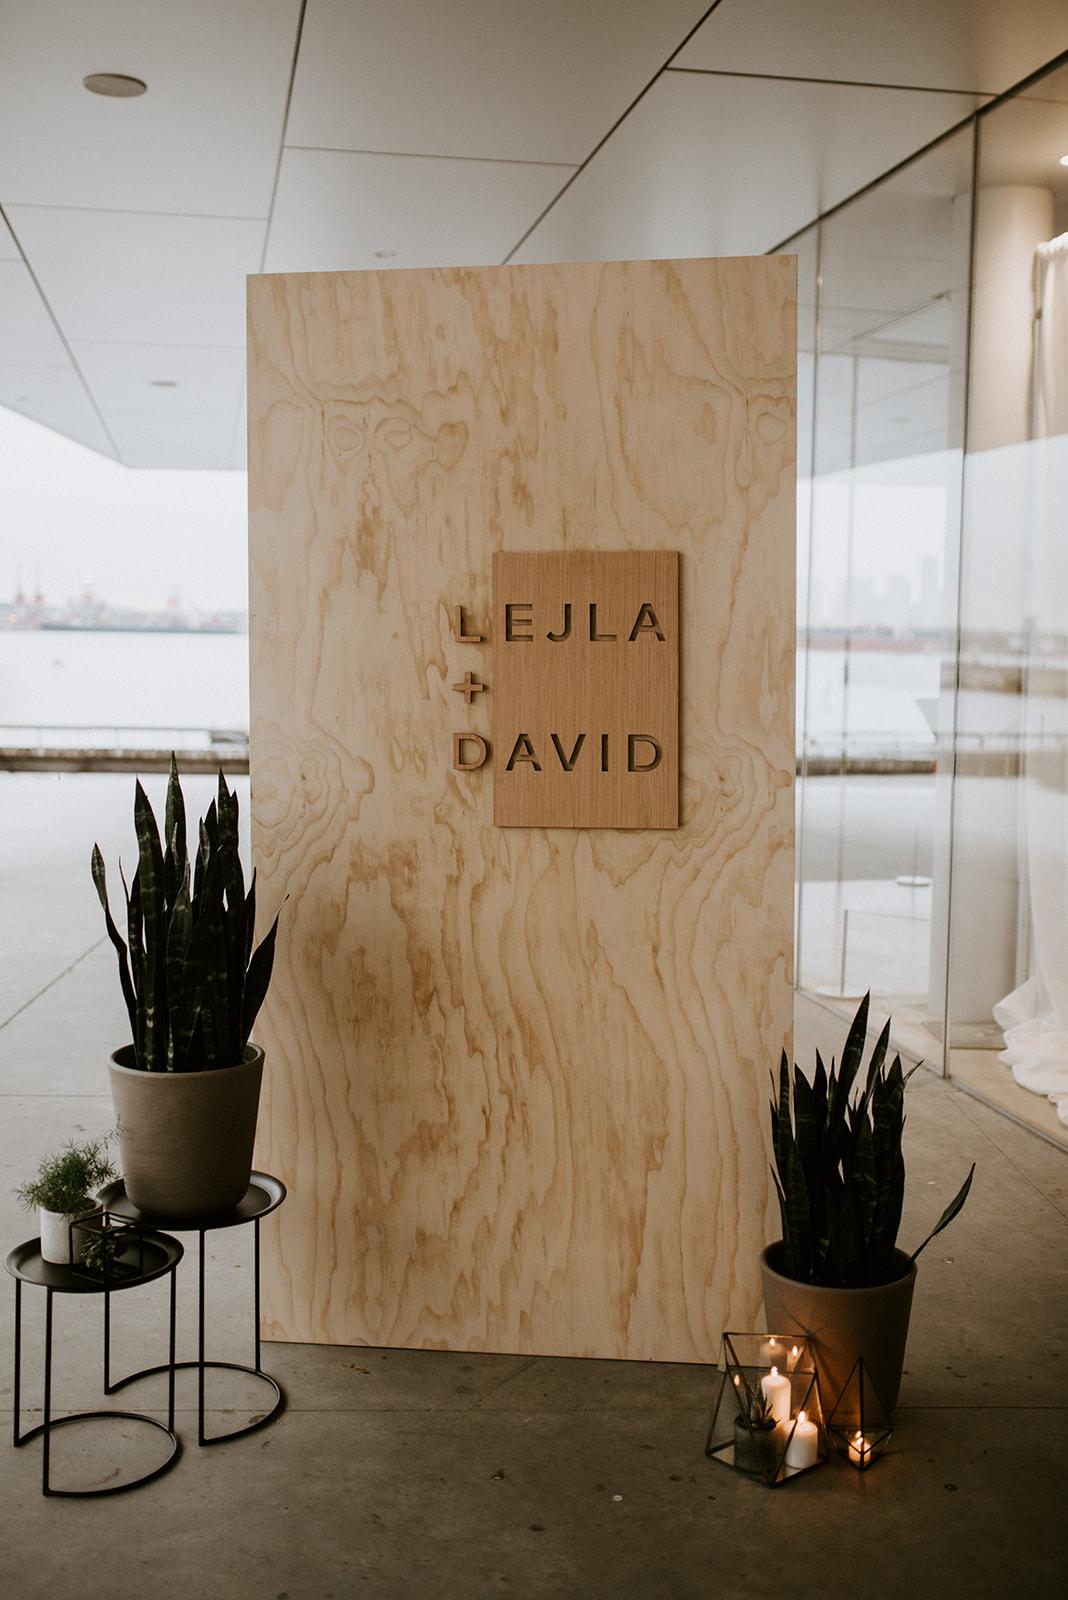 DavidLejla-1.jpg